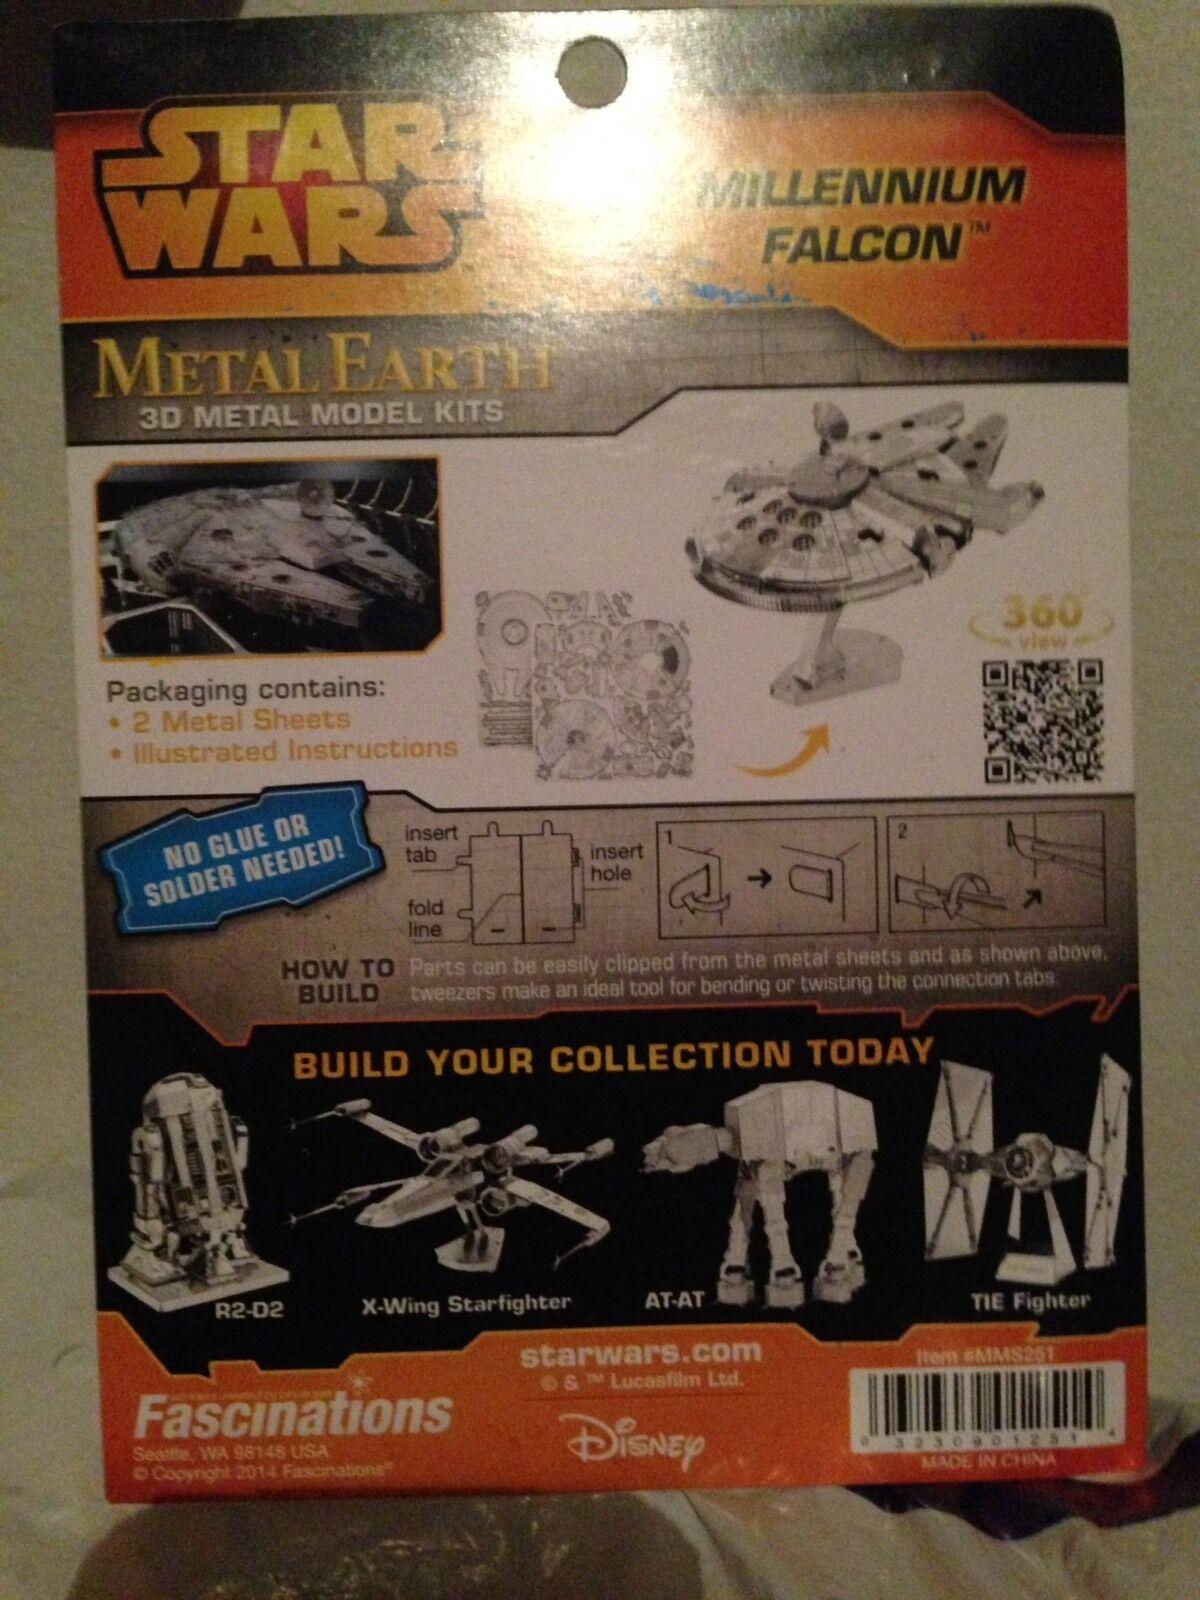 Brand New Star Wars R2D2 & The Millennium Falcon Falcon Falcon Metal Earth 3D Model Kit 45bf39